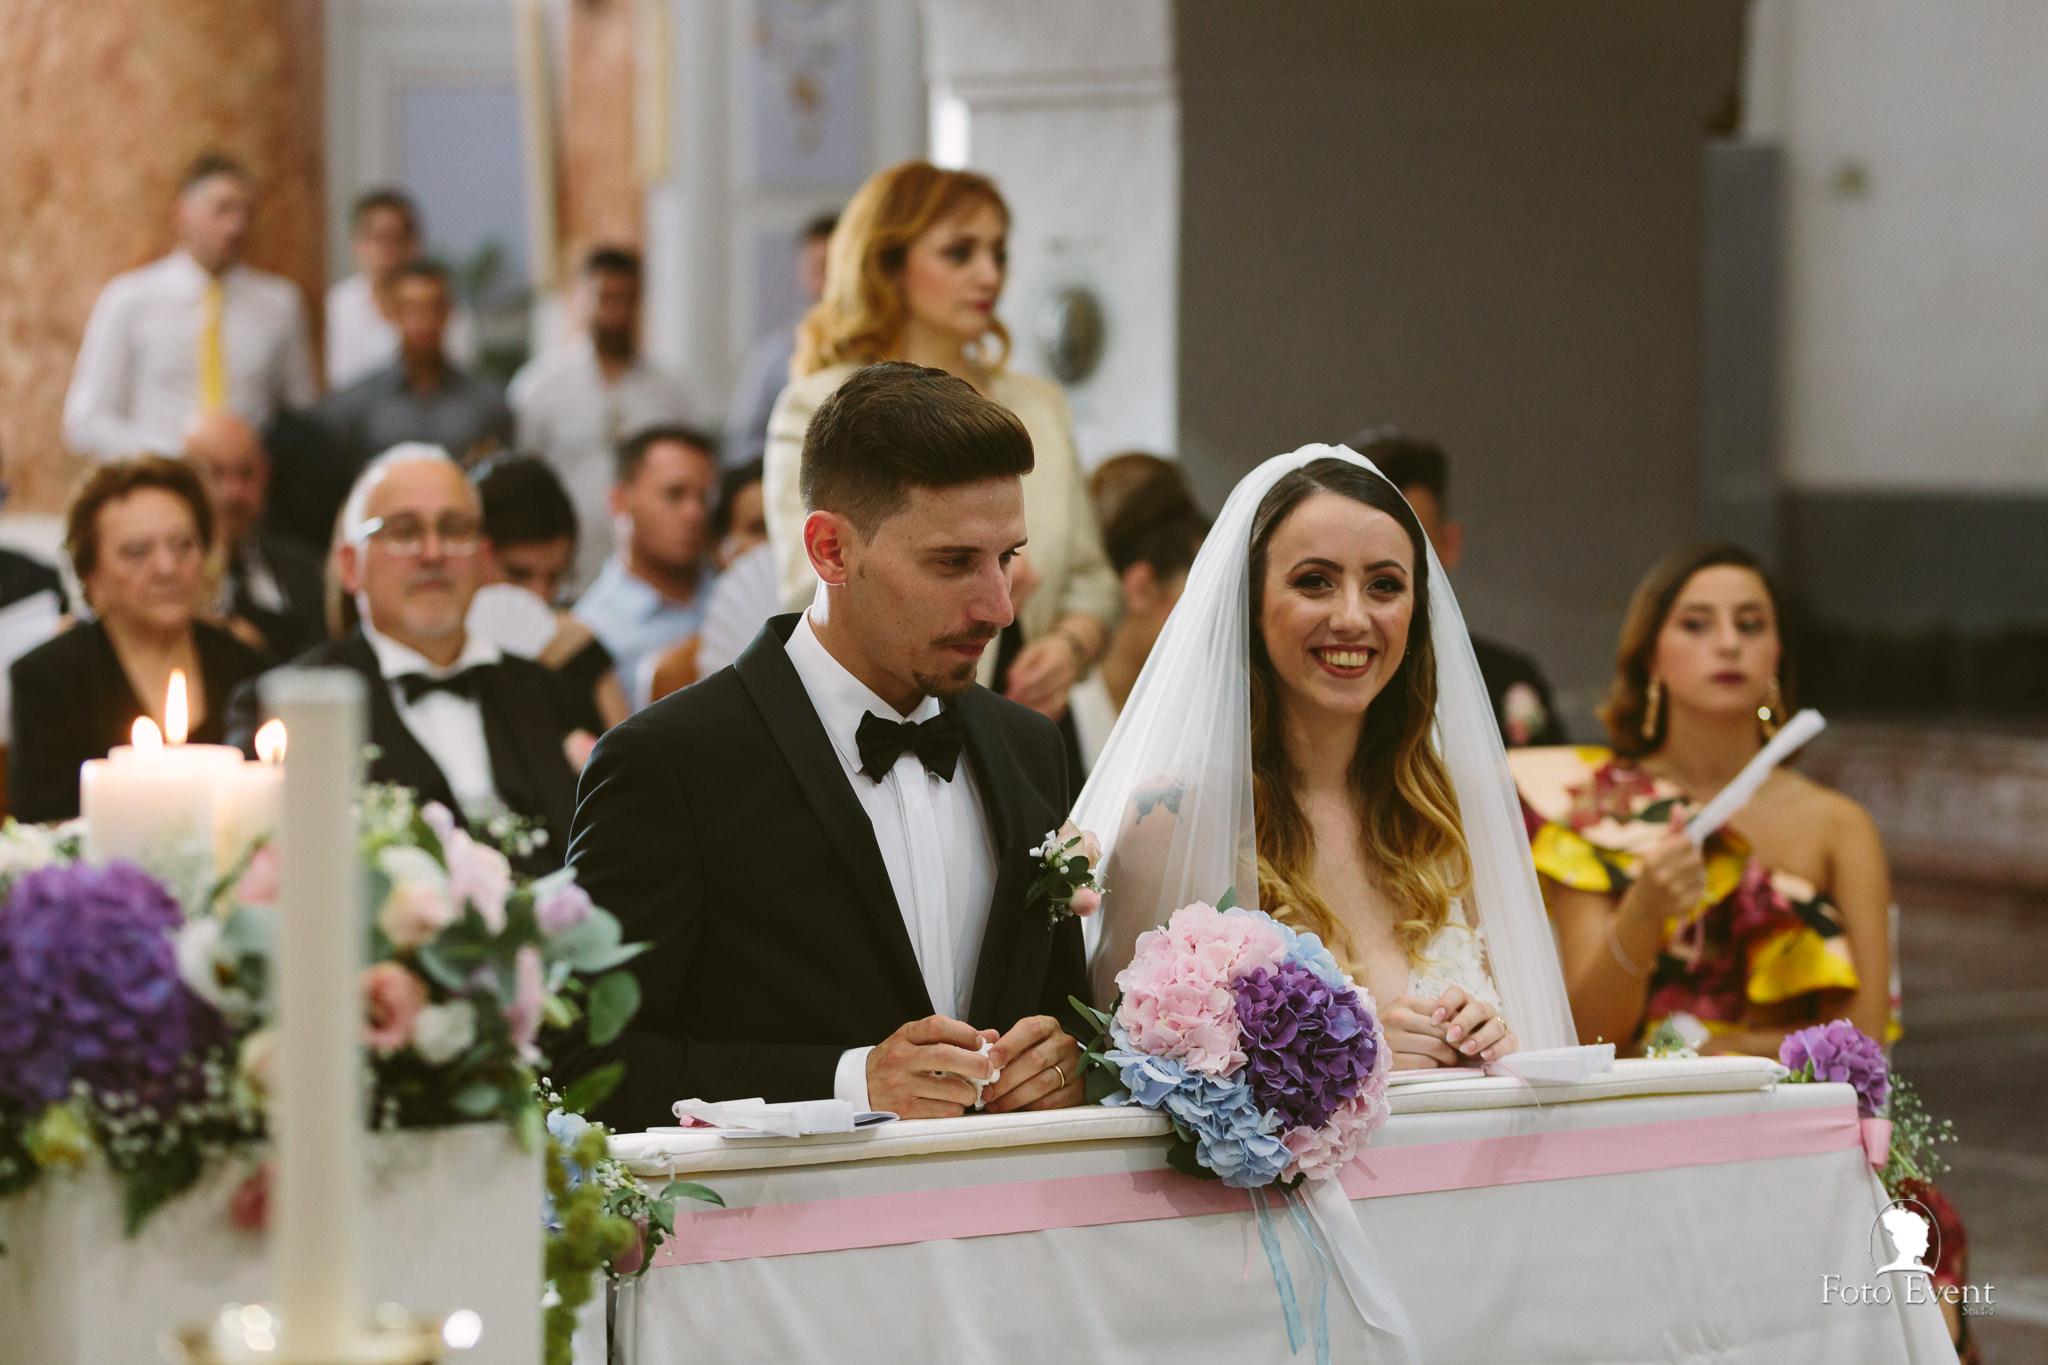 038-2019-08-22-Matrimonio-Angela-e-Nicola-Iaconis-zoom-464